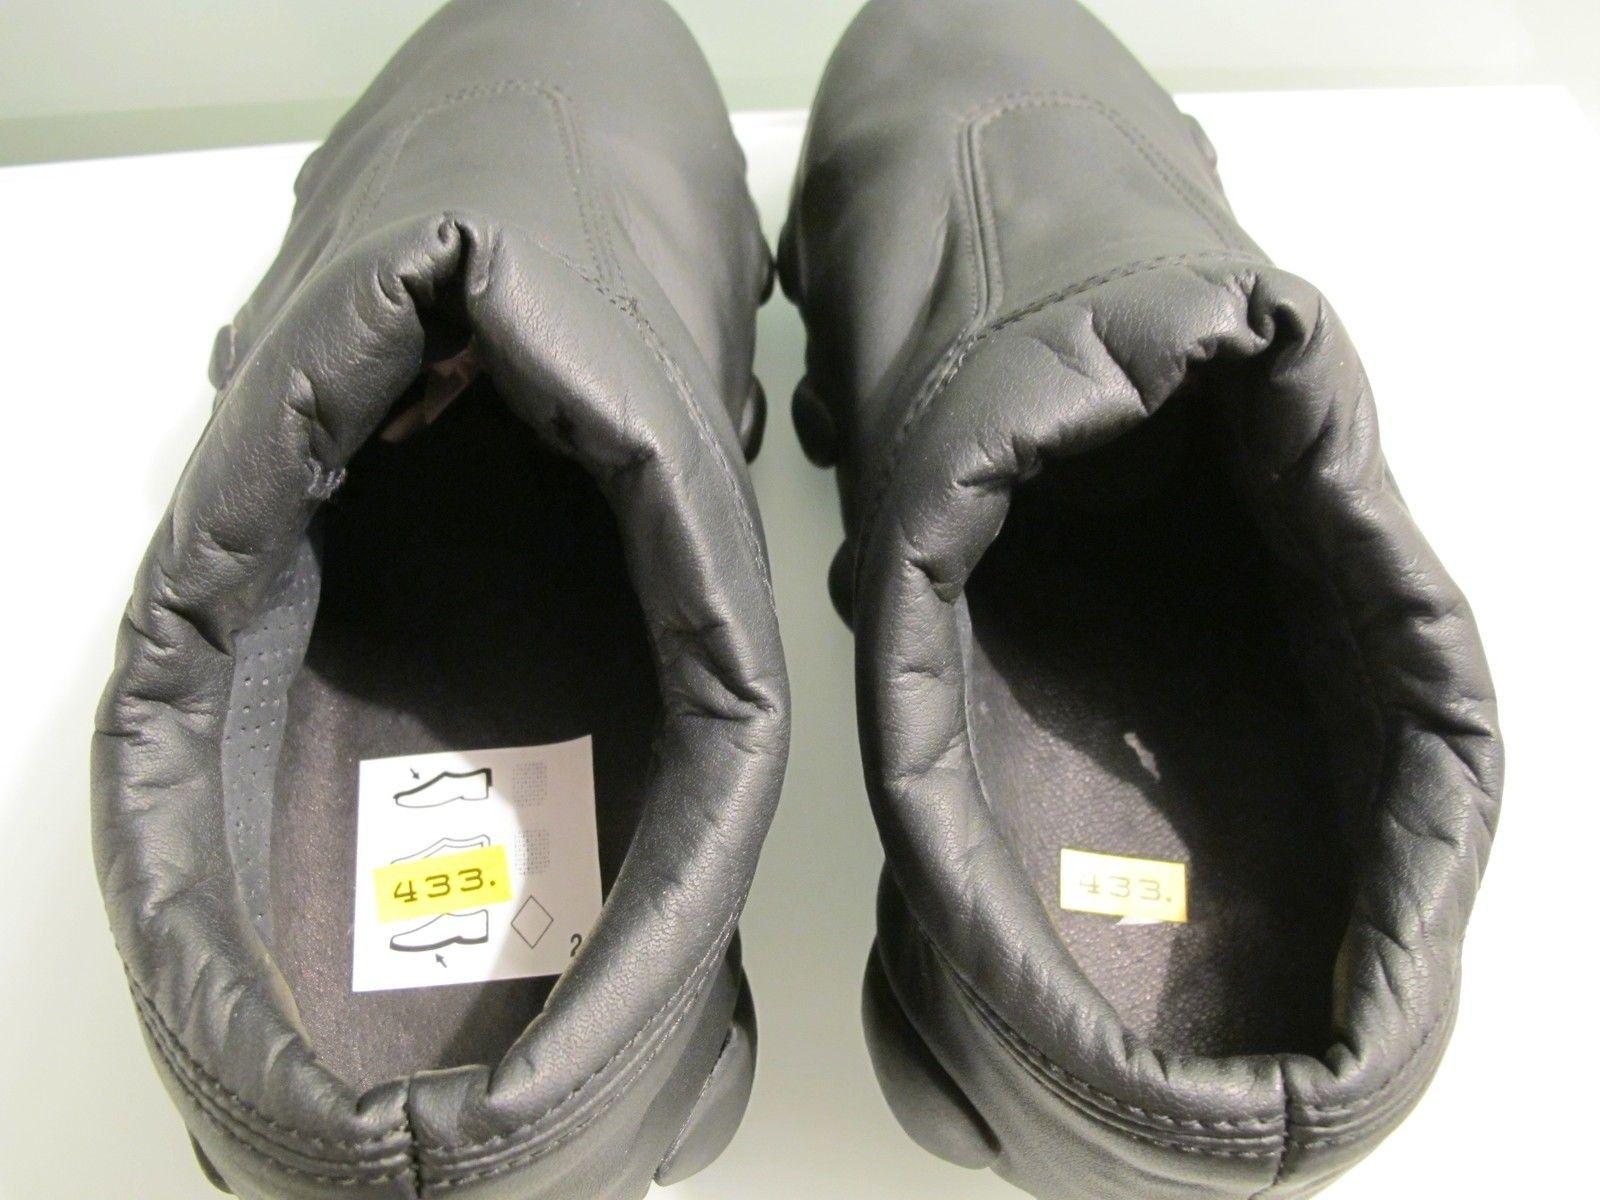 Arrowhead/ Flesh Prototype Shoes...anyone has any info on this? - $_57.jpg